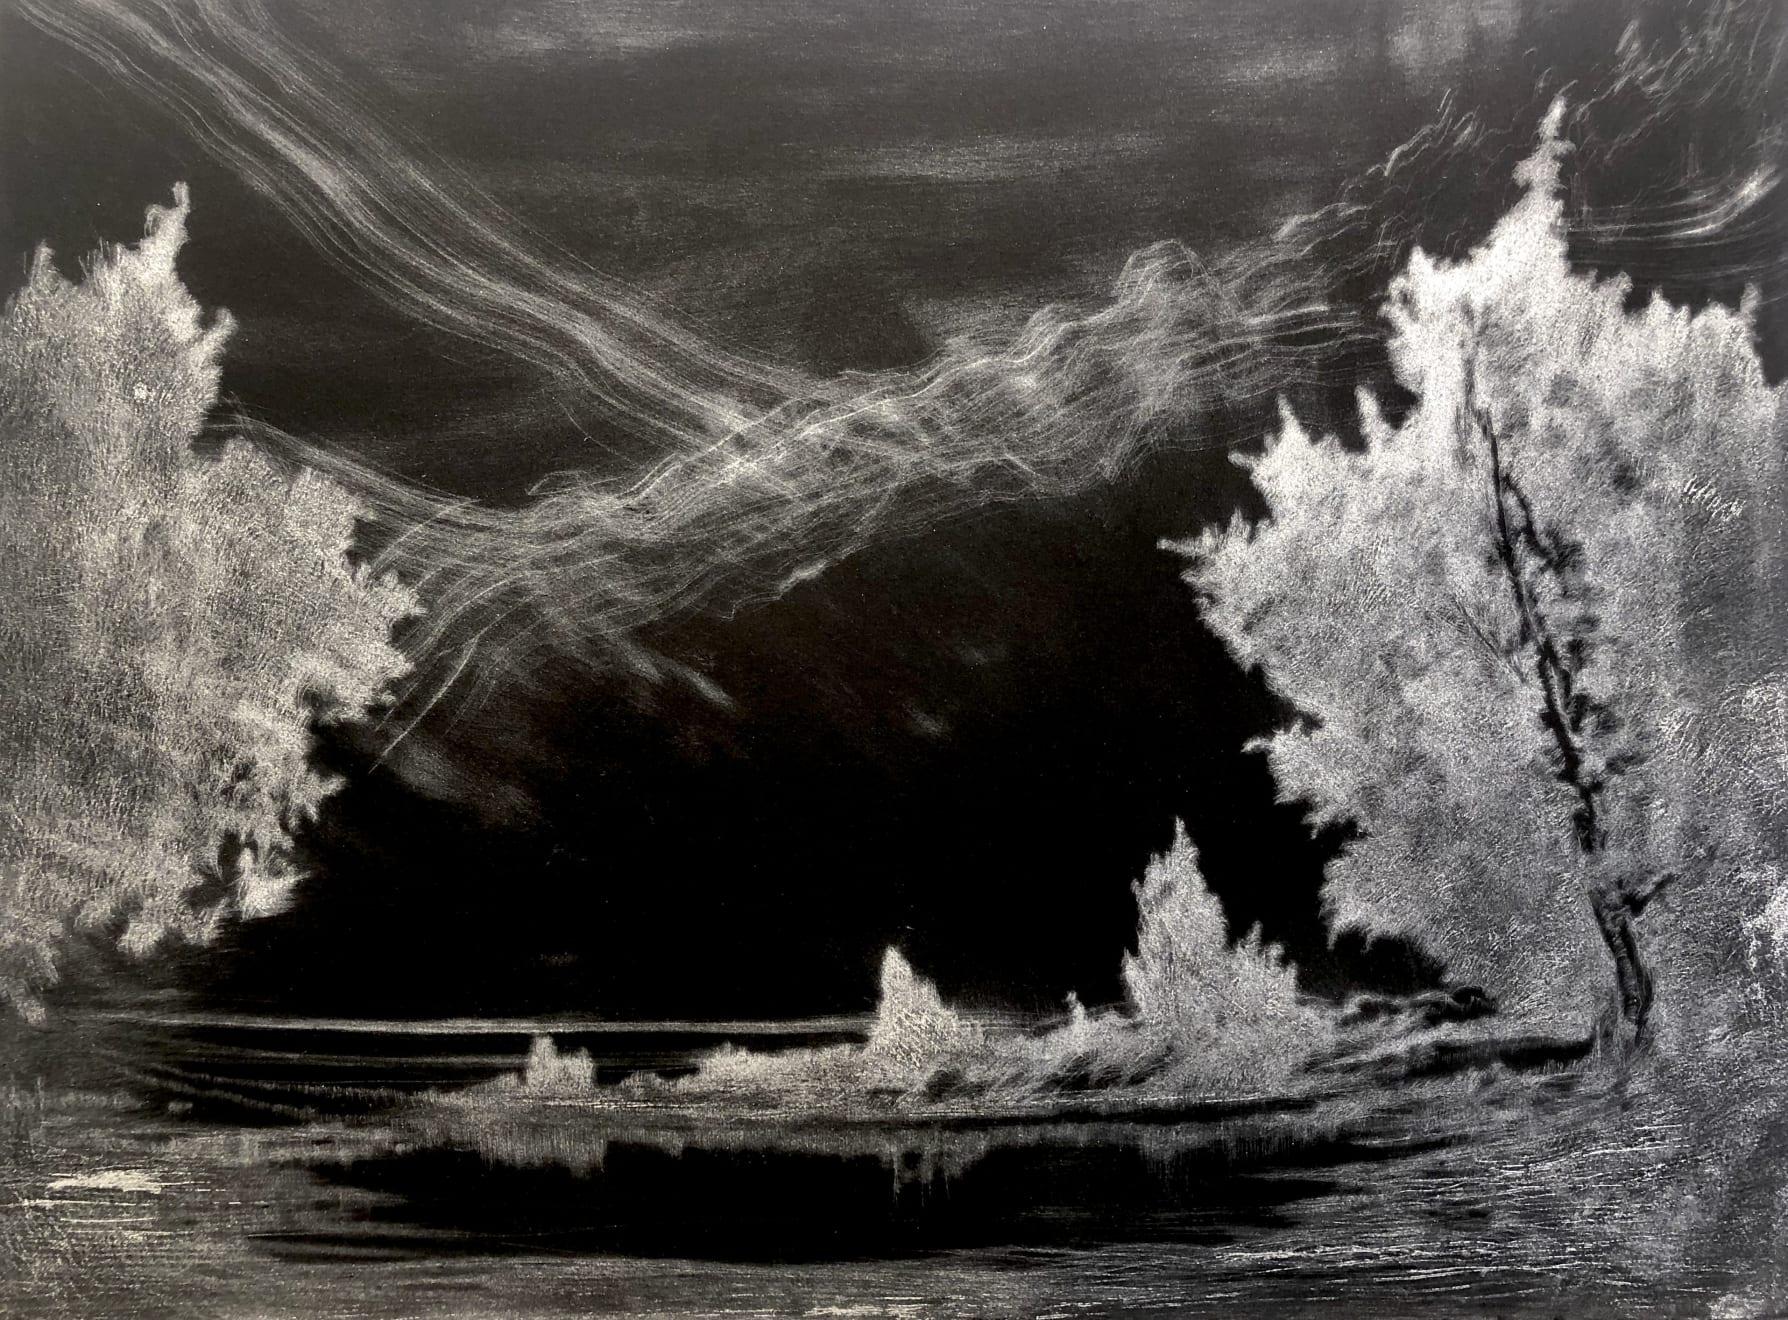 Summer Auction 2020, LOT 140 - Edward Twohig - 'Untitled', 2020